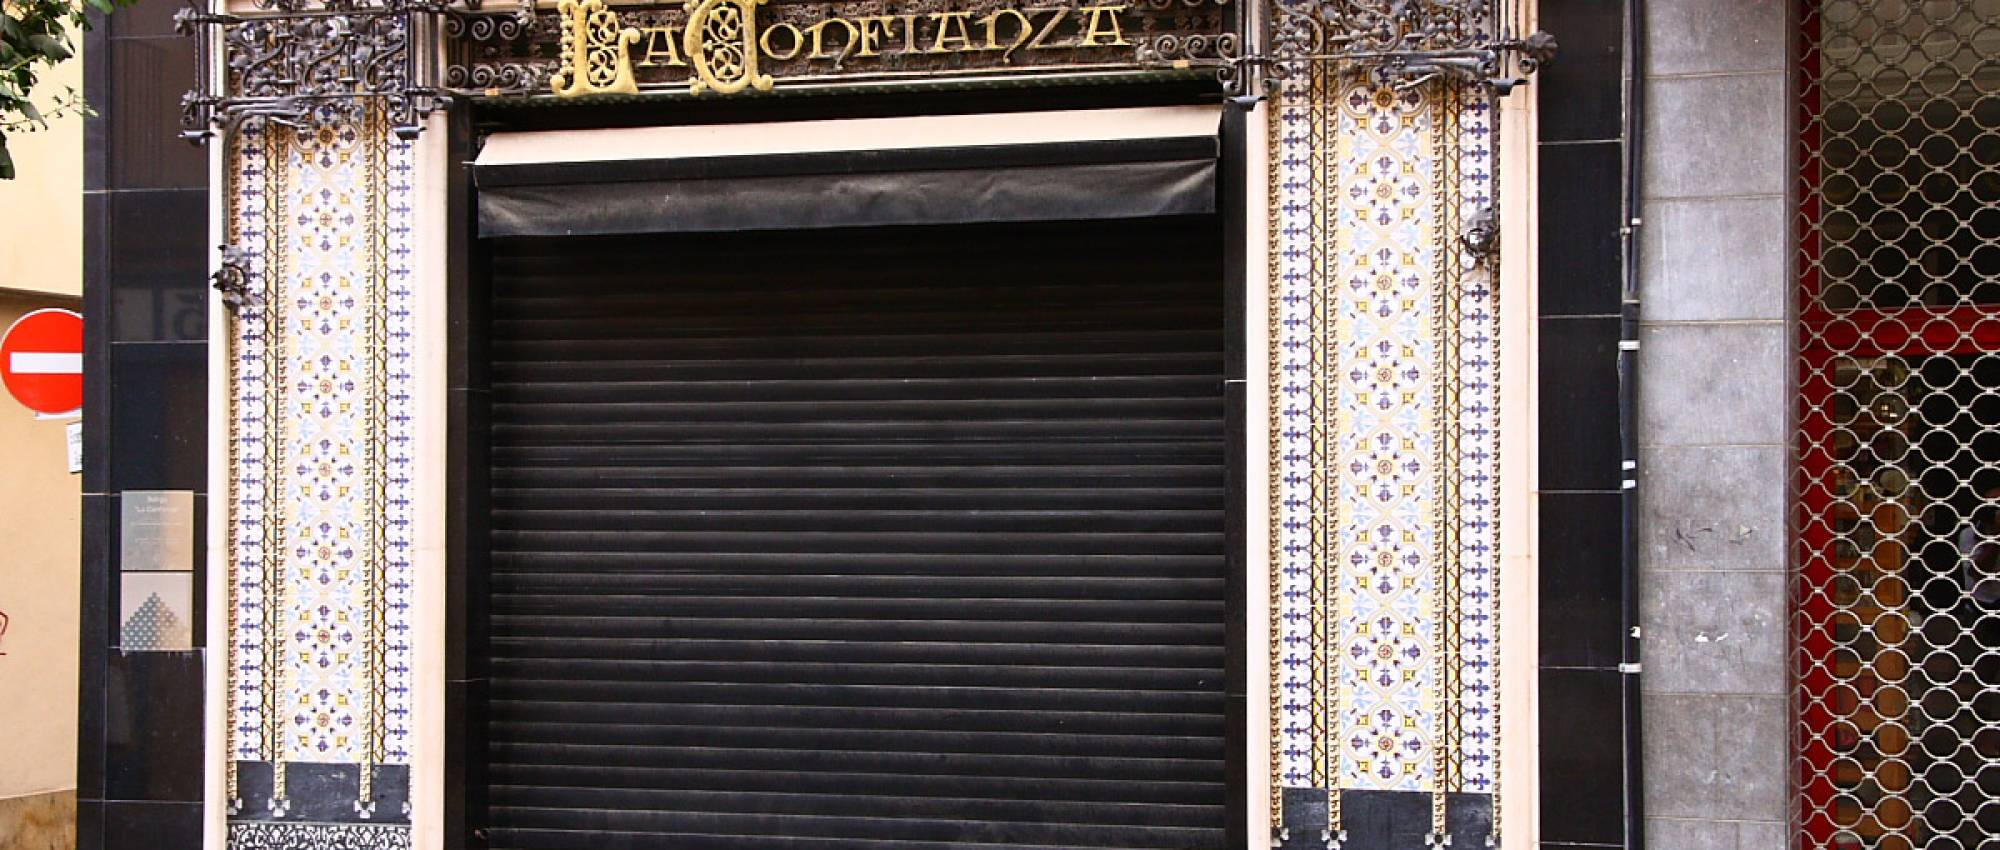 Porta de la Fideueria La Confiança de Mataró. CC BY 3.0 - amadalvarez / Wikimedia Commons